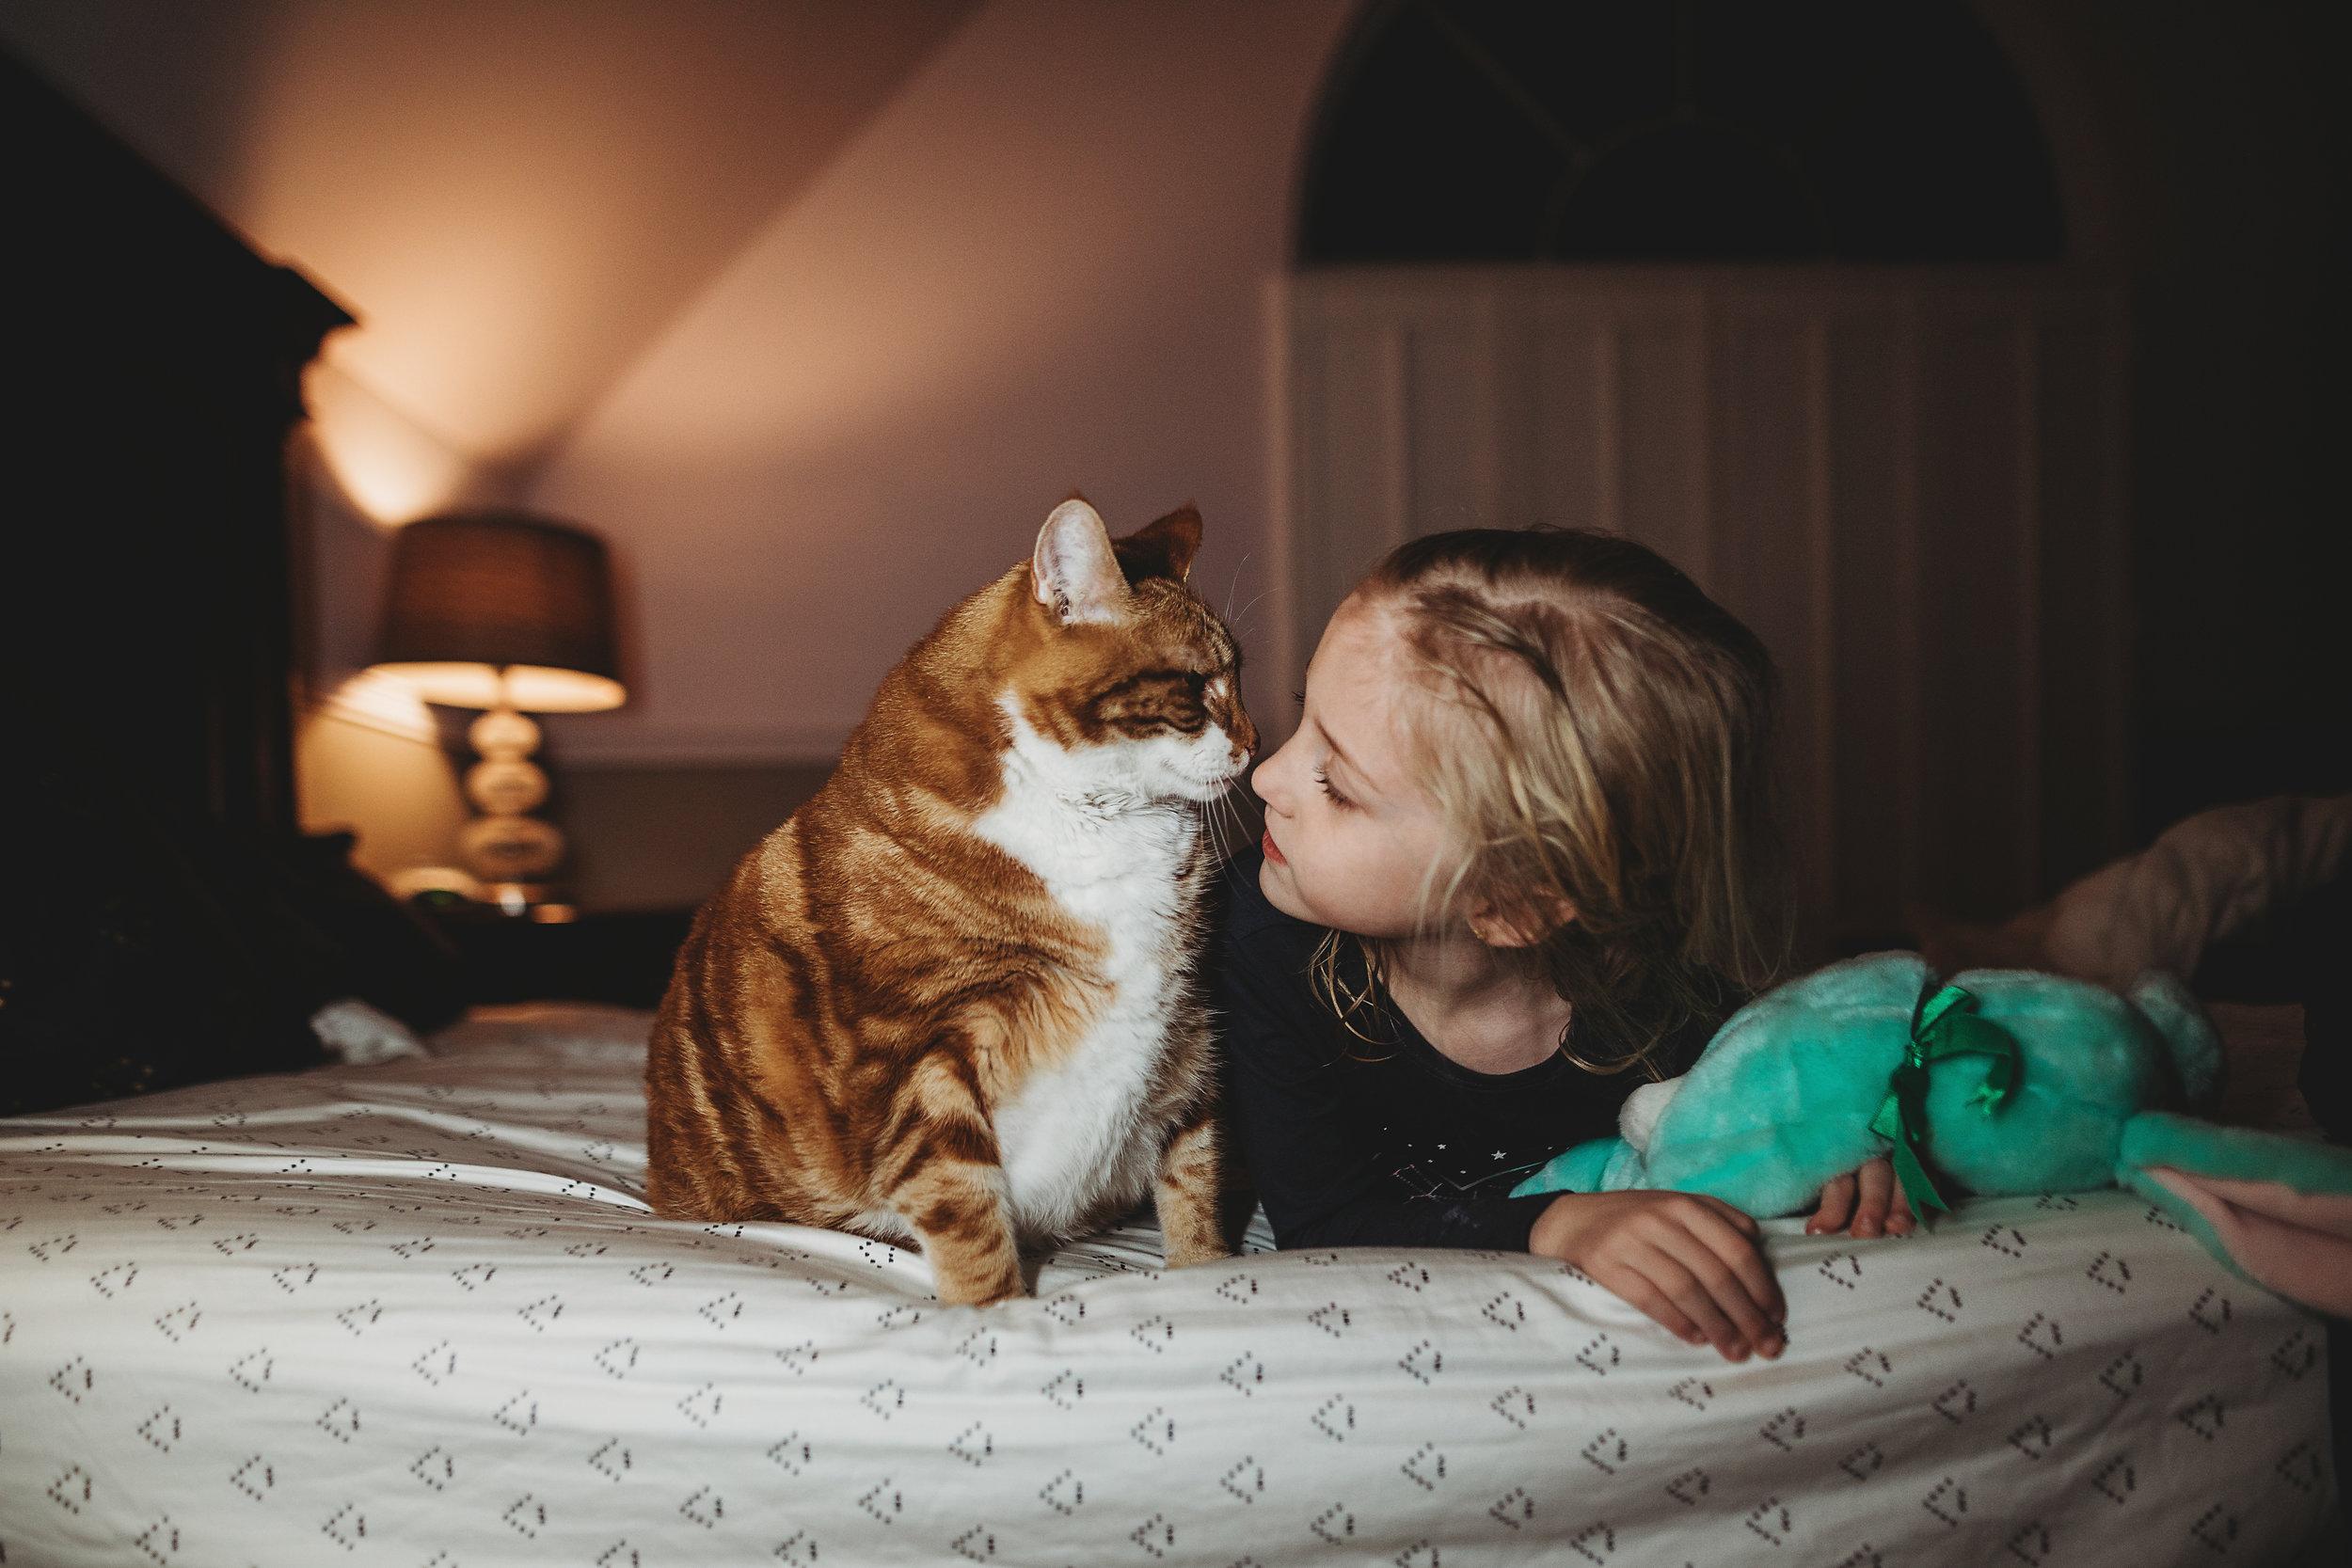 hello-olivia-photography-long-island-photographer-lifestyle-child-kiss-cat-girl-love-pet-animal.jpg